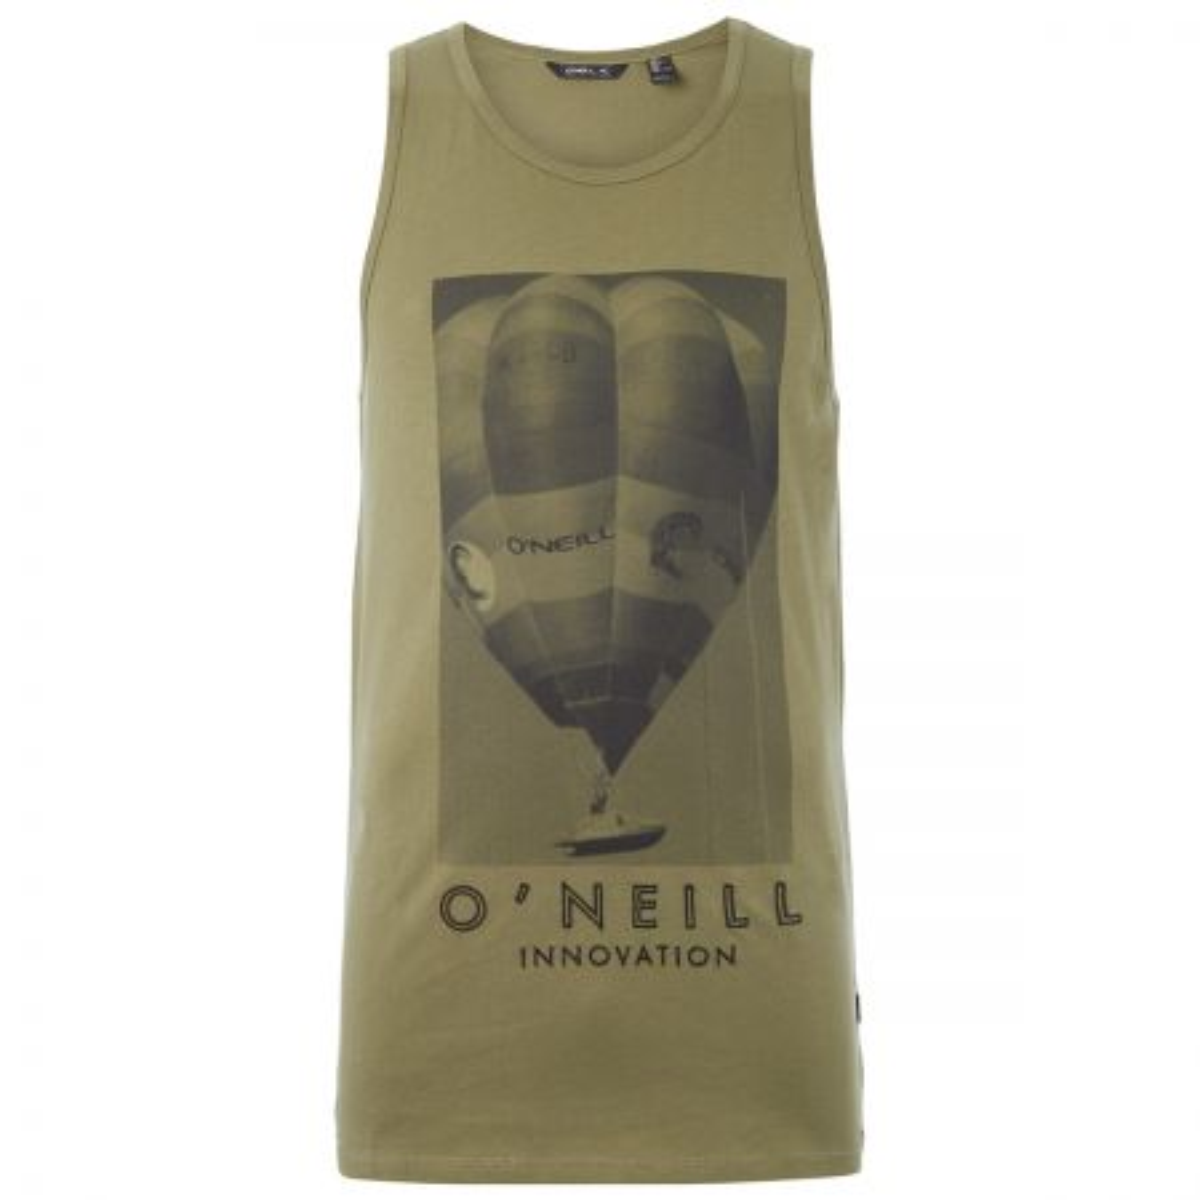 O'Neill Hot Air Balloon majica